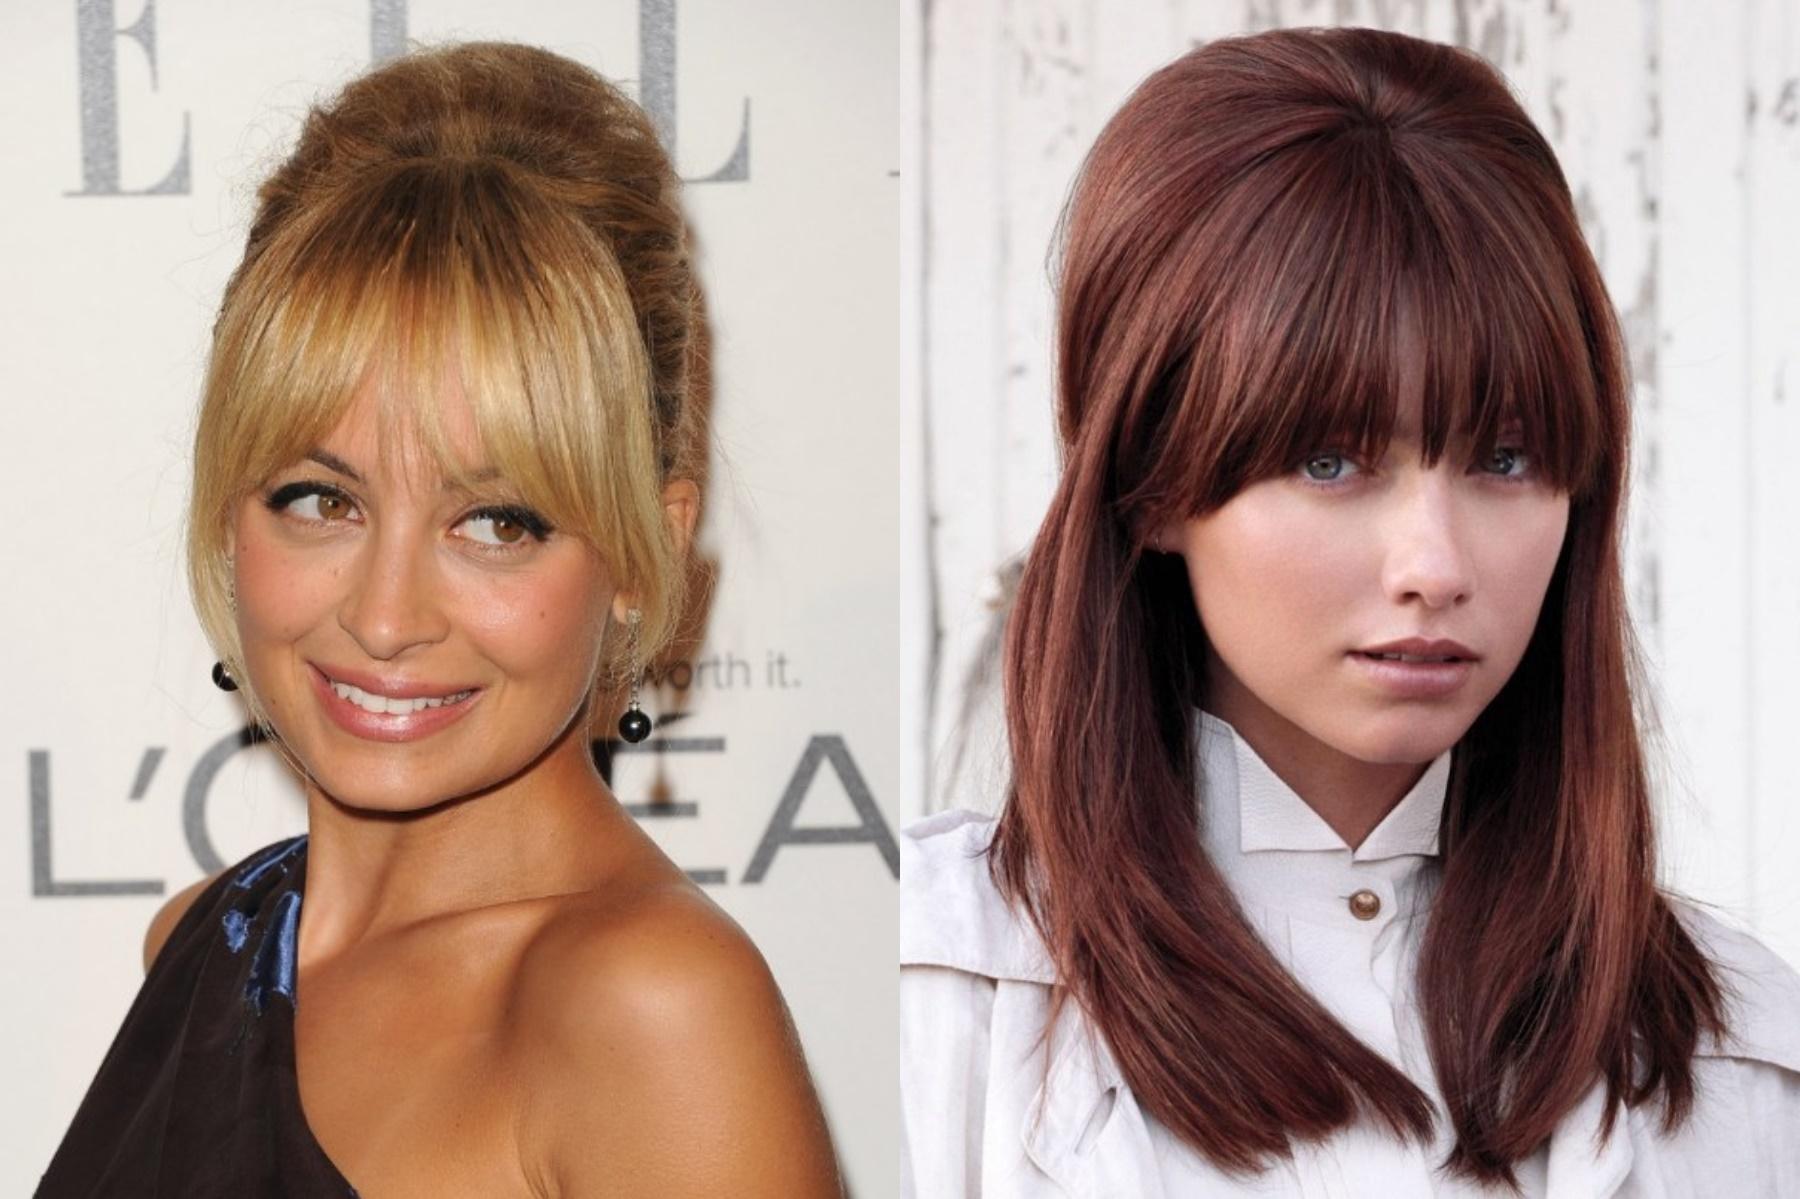 2018 Long Bangs Hairstyles For Women's - Haircuts Bangs 6